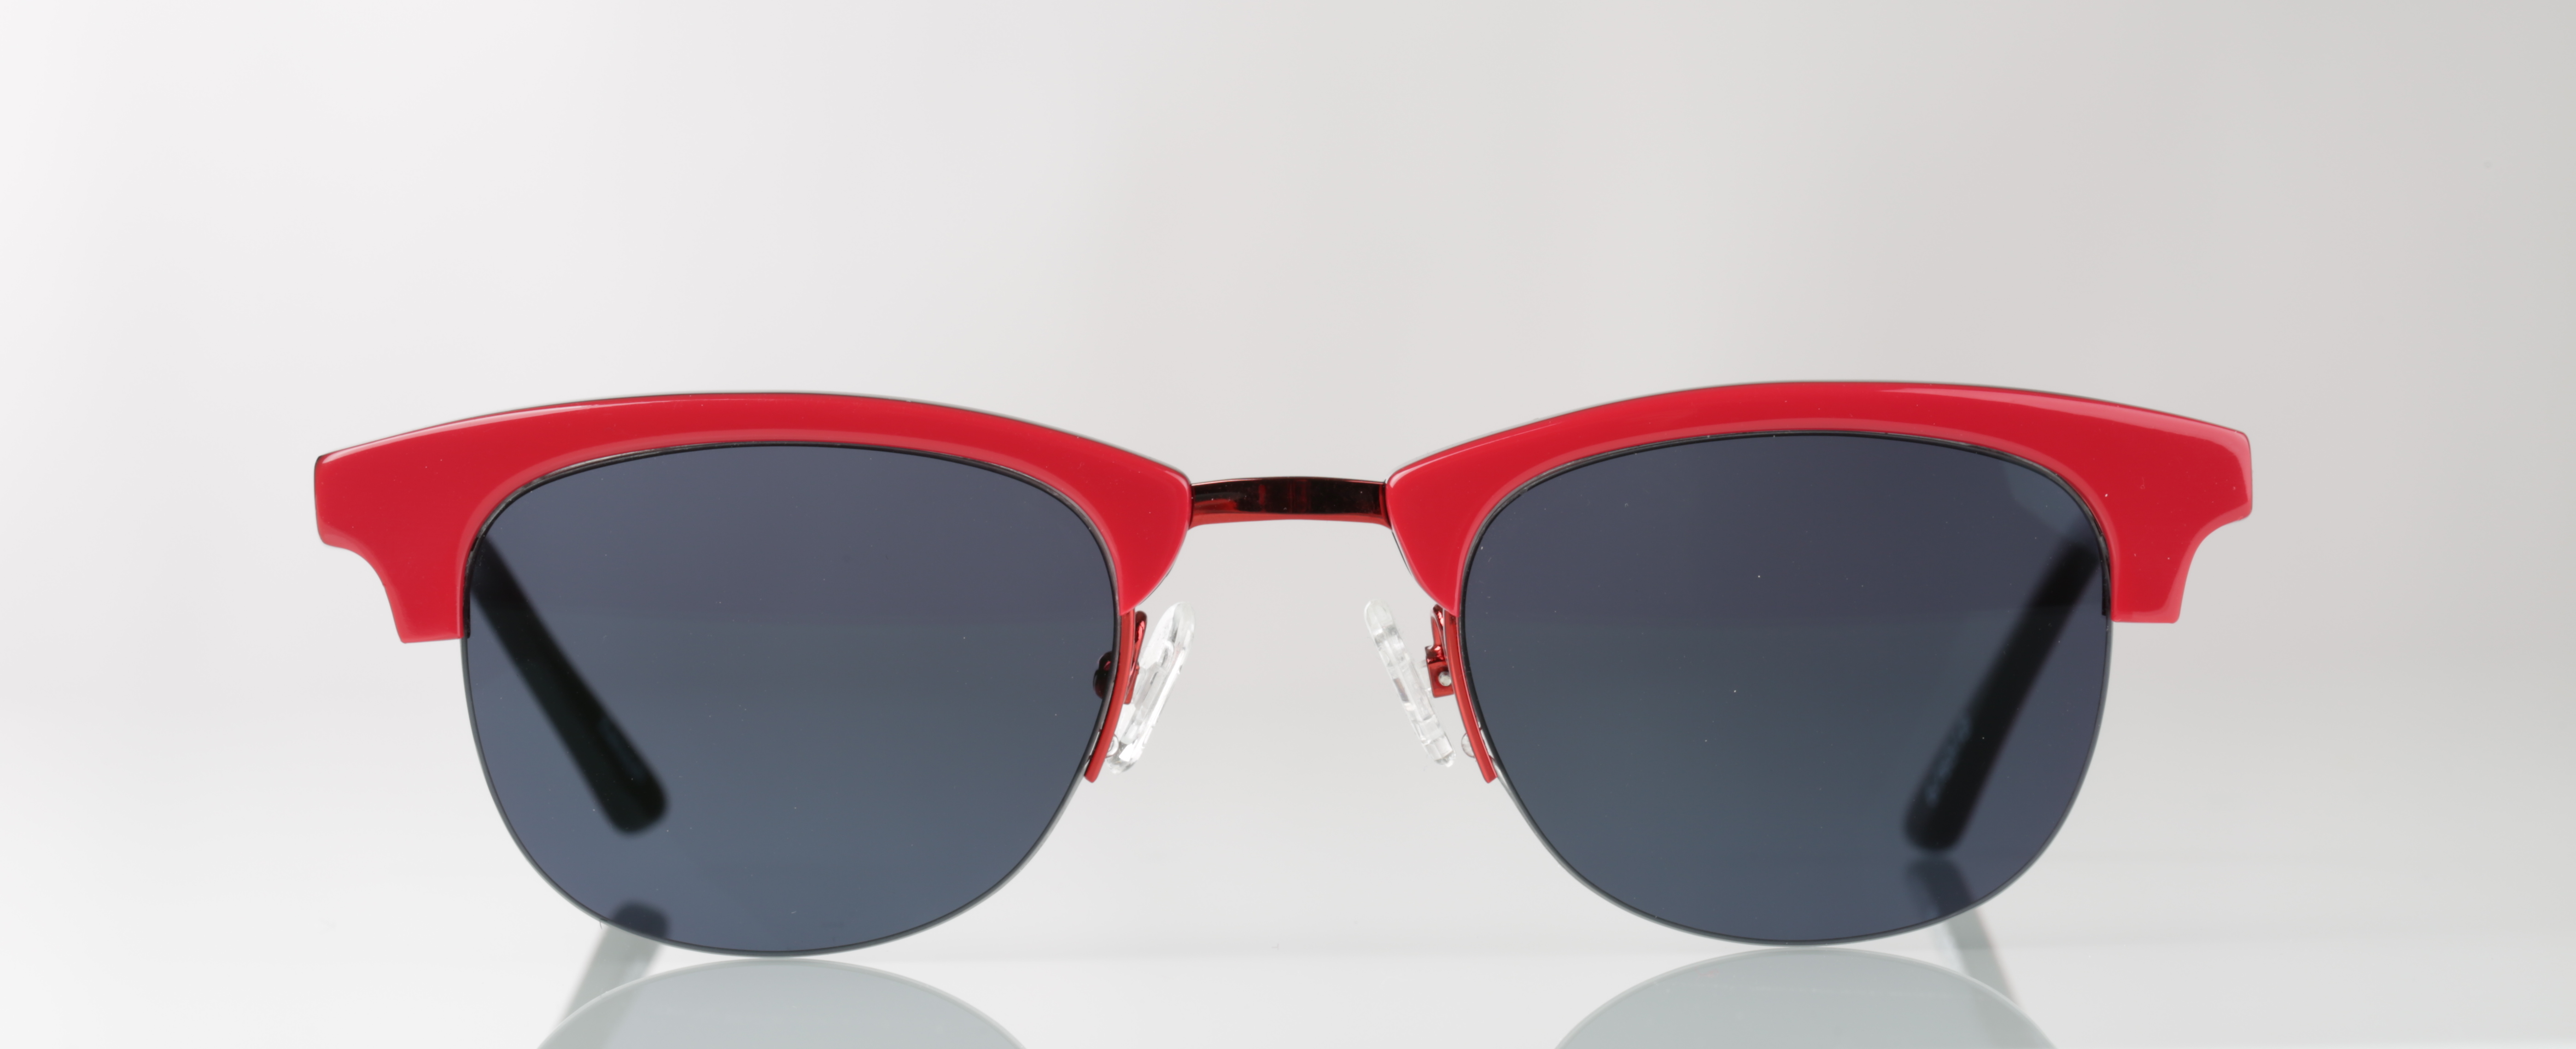 Zenni Optical Polka Dot Glasses : Zenni DIY with Polka Dots Through the Lens